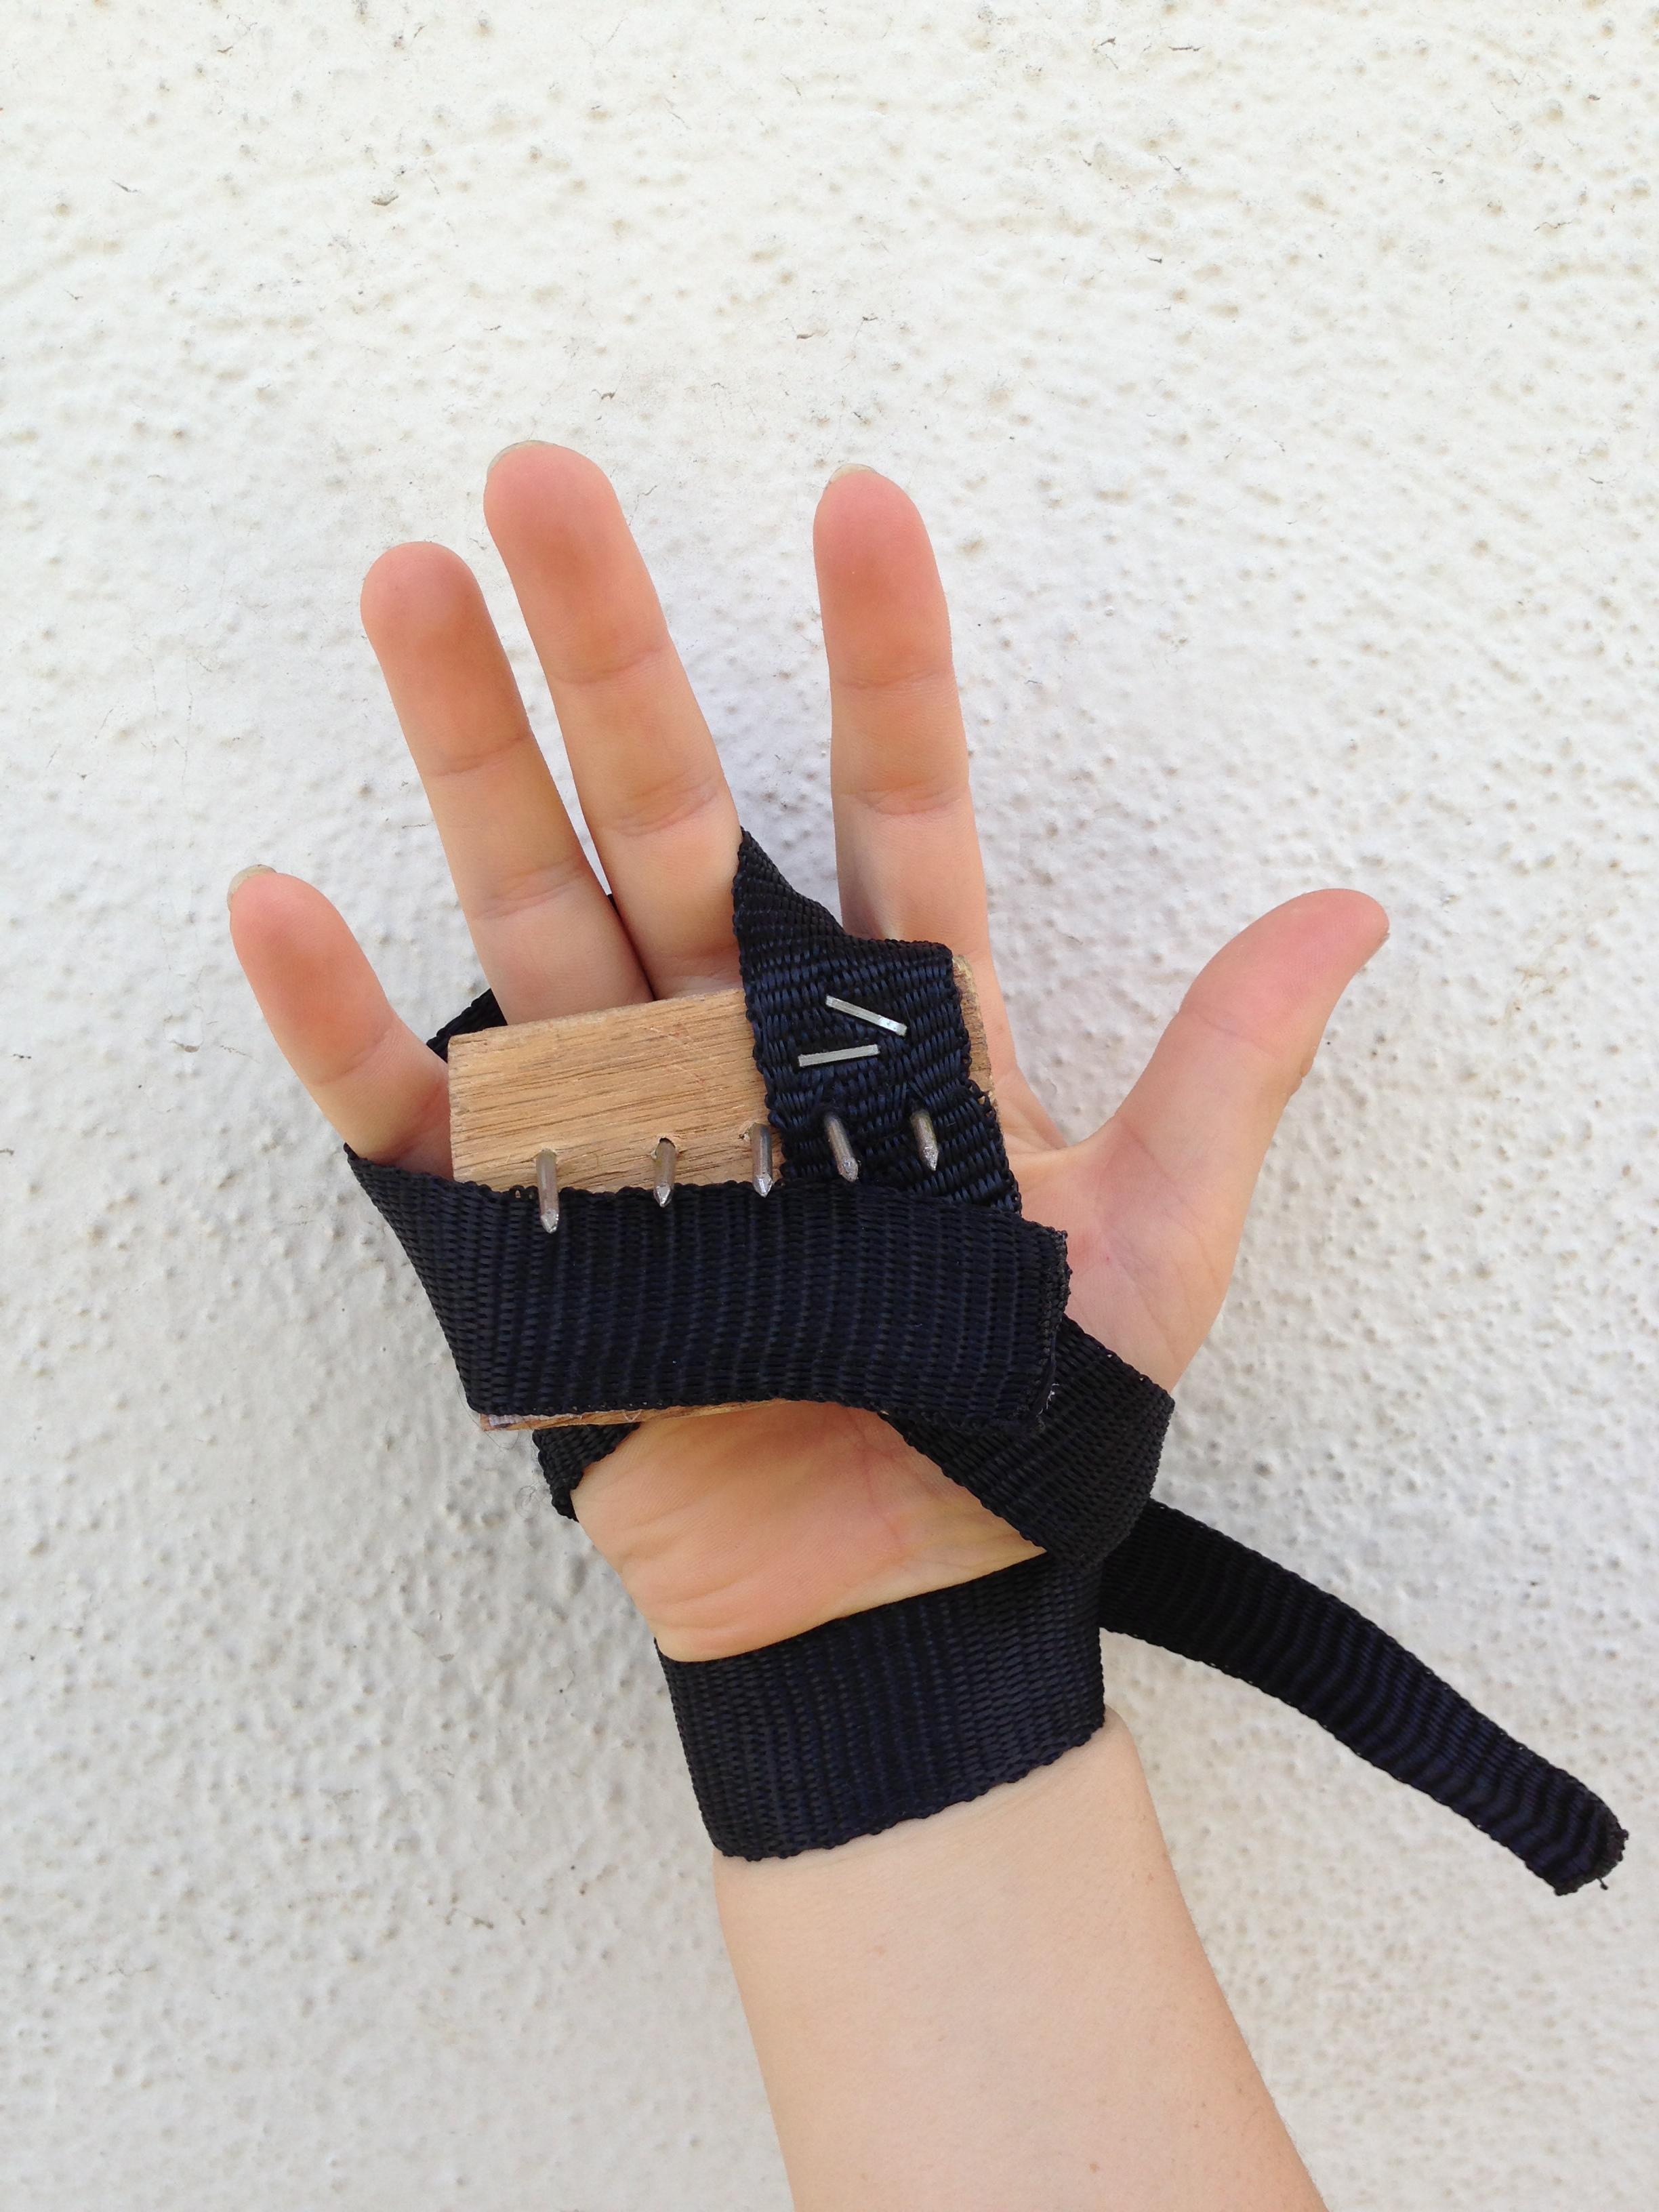 Ninja Climbing Claws, Shuko